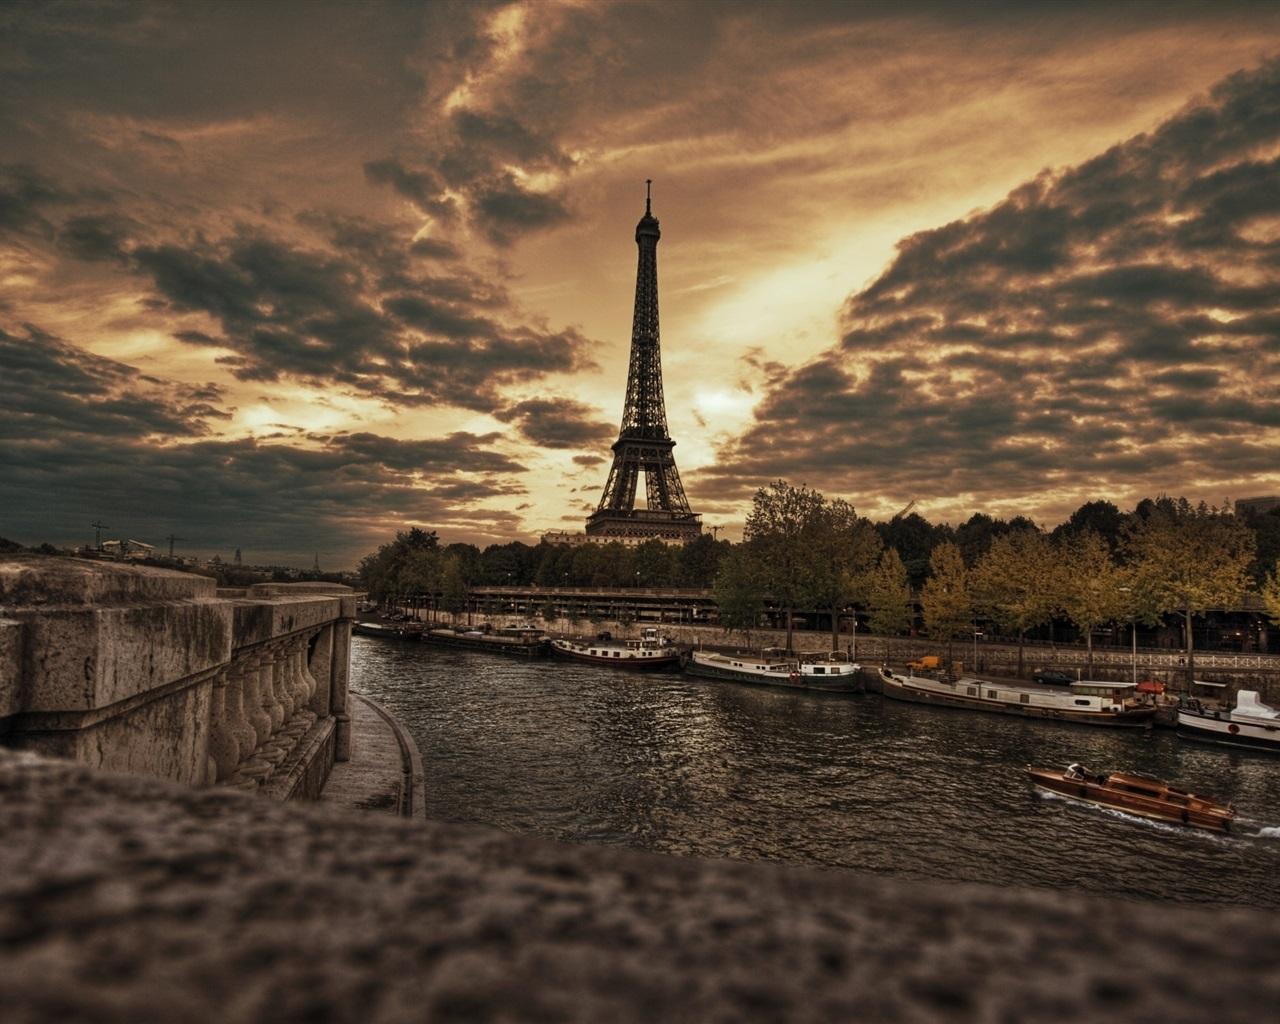 Обои Эйфелева башня, Облака, вид, лодки, красиво. Города foto 7